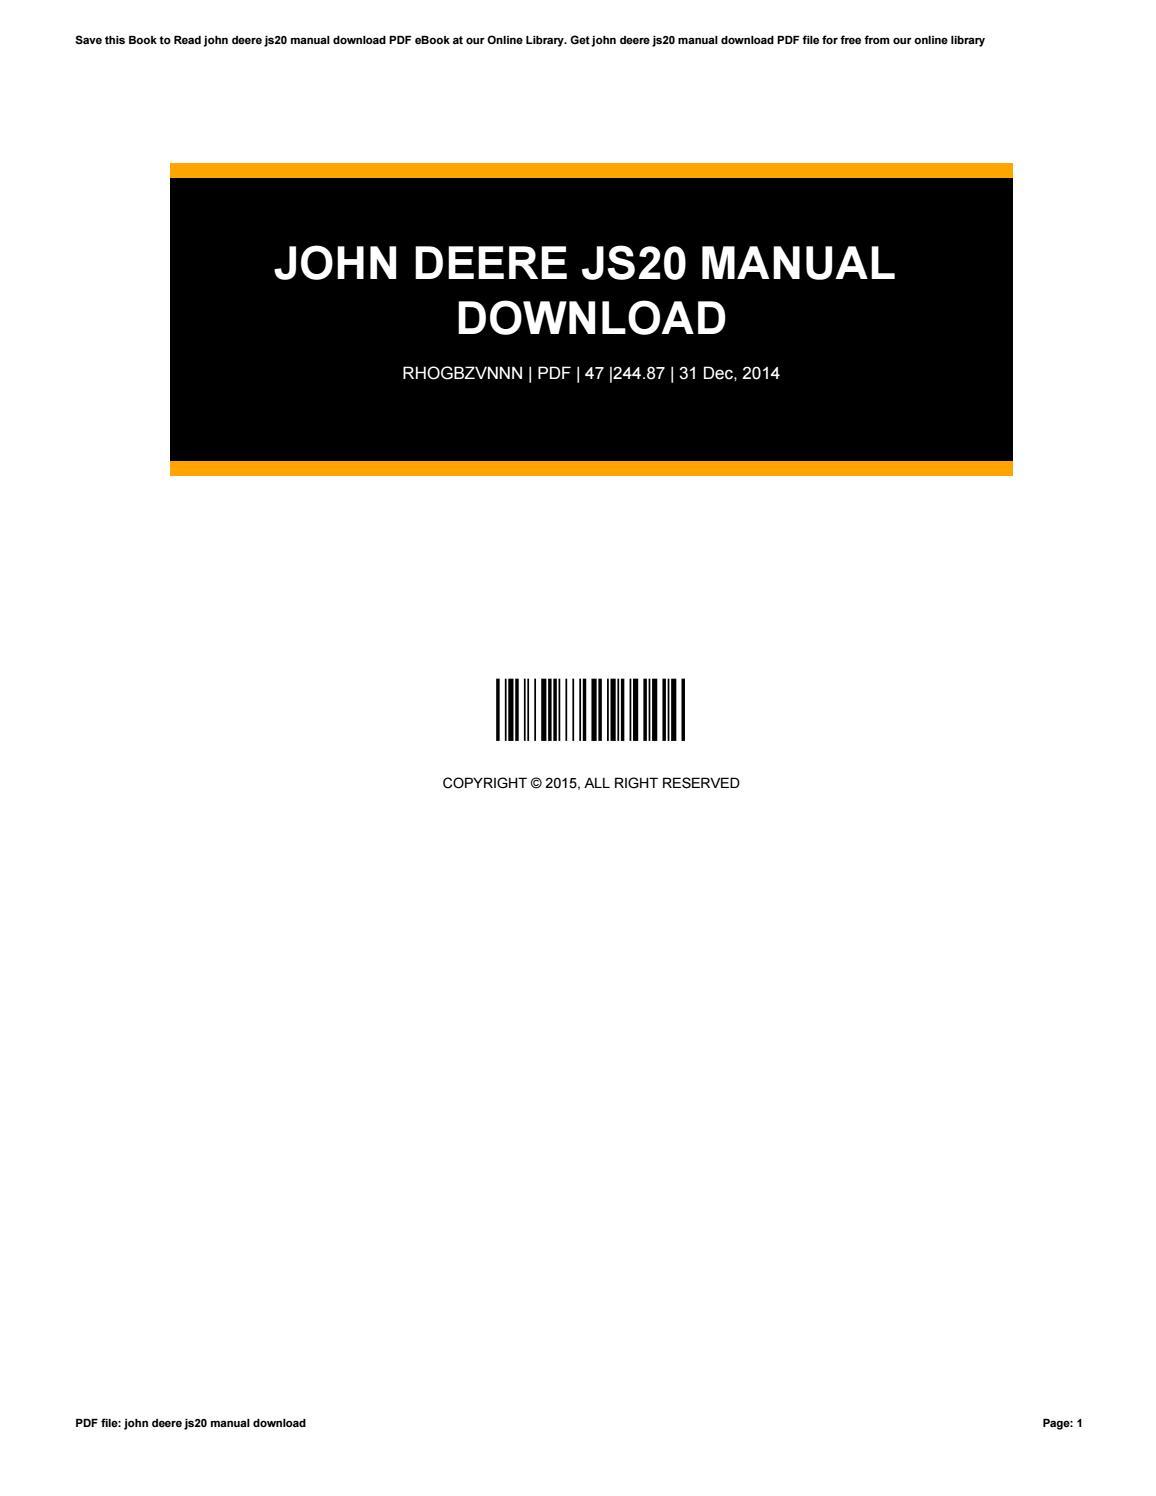 Pdf-3714] instruction manual john deere js20   2019 ebook library.